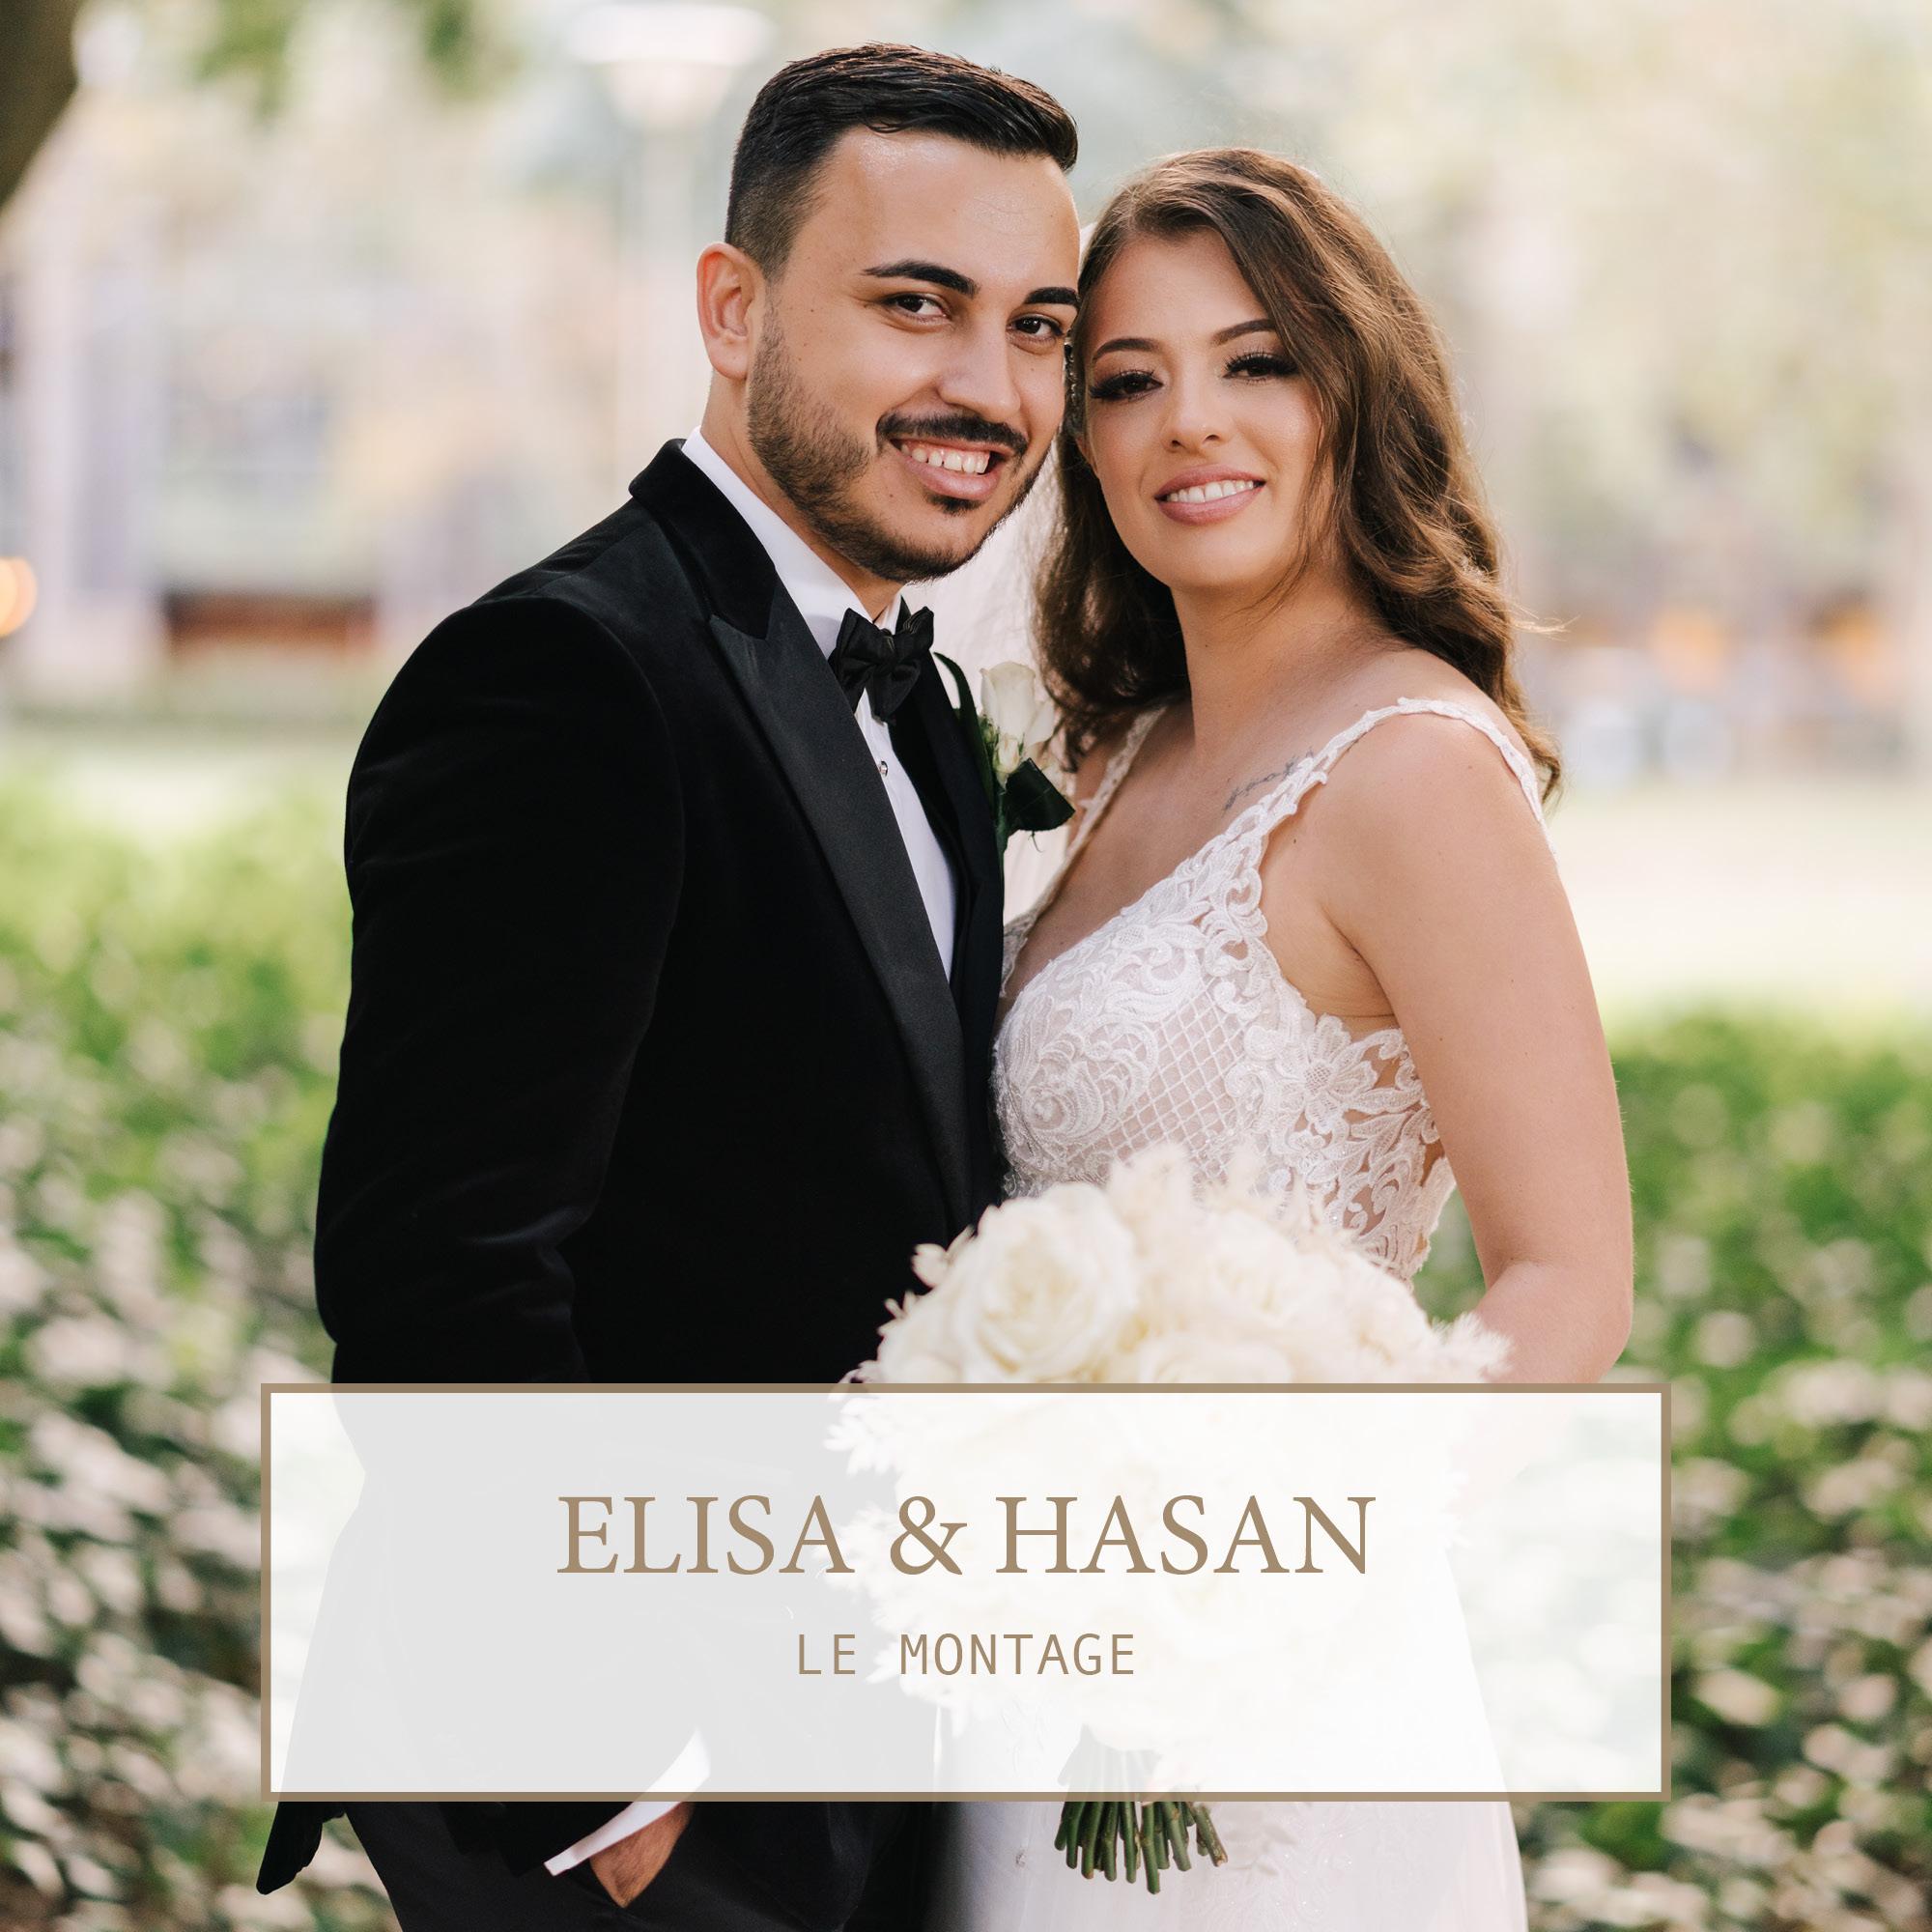 Le Montage Wedding: Elisa & Hasan 1